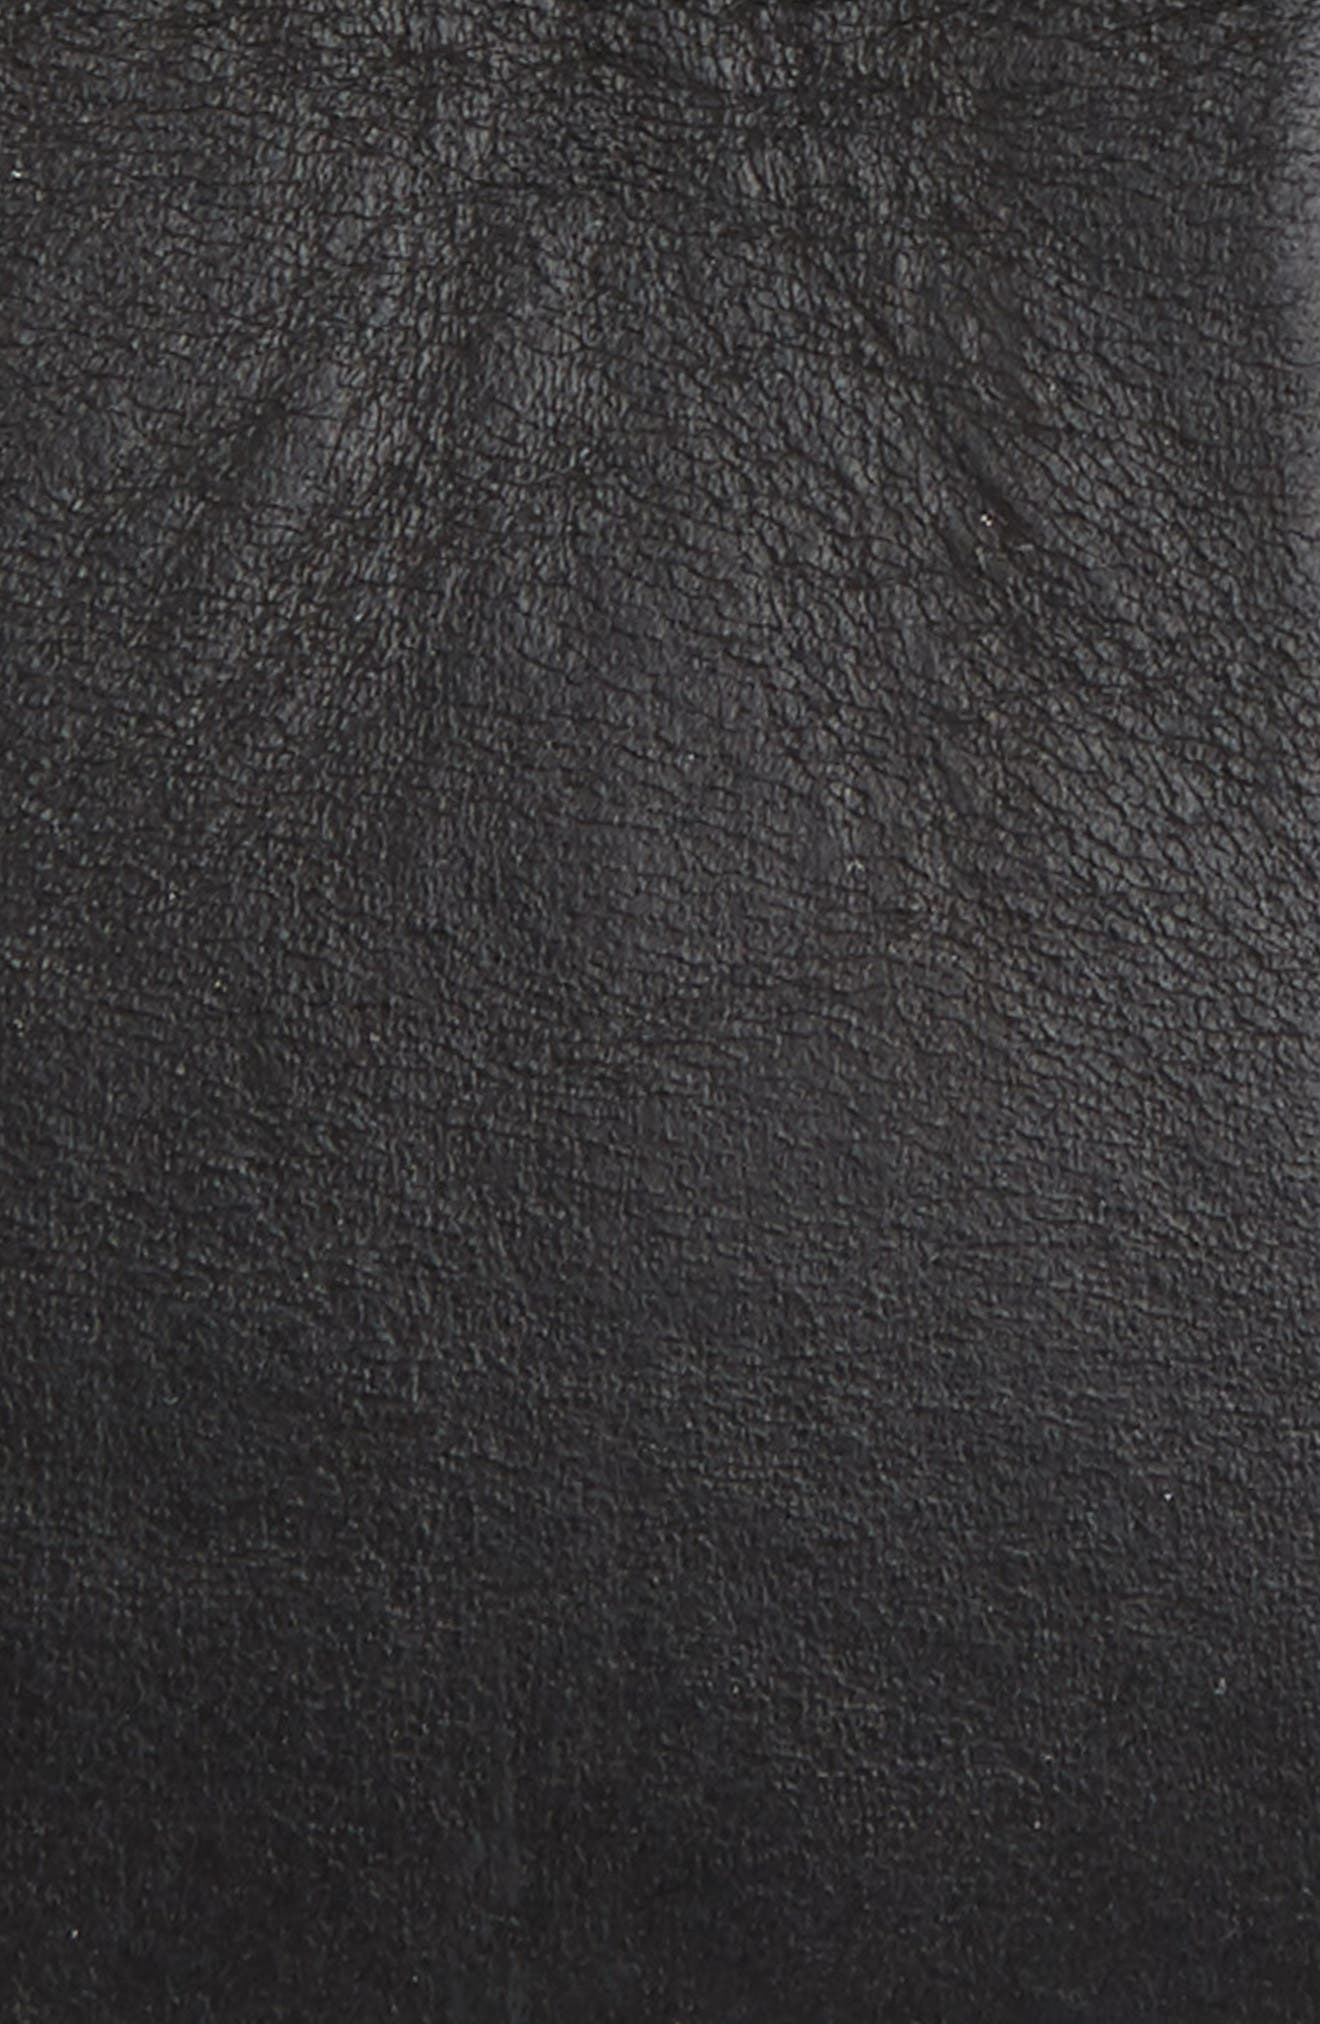 Vachetta Leather Belt,                             Main thumbnail 1, color,                             FLORIDA BLACK